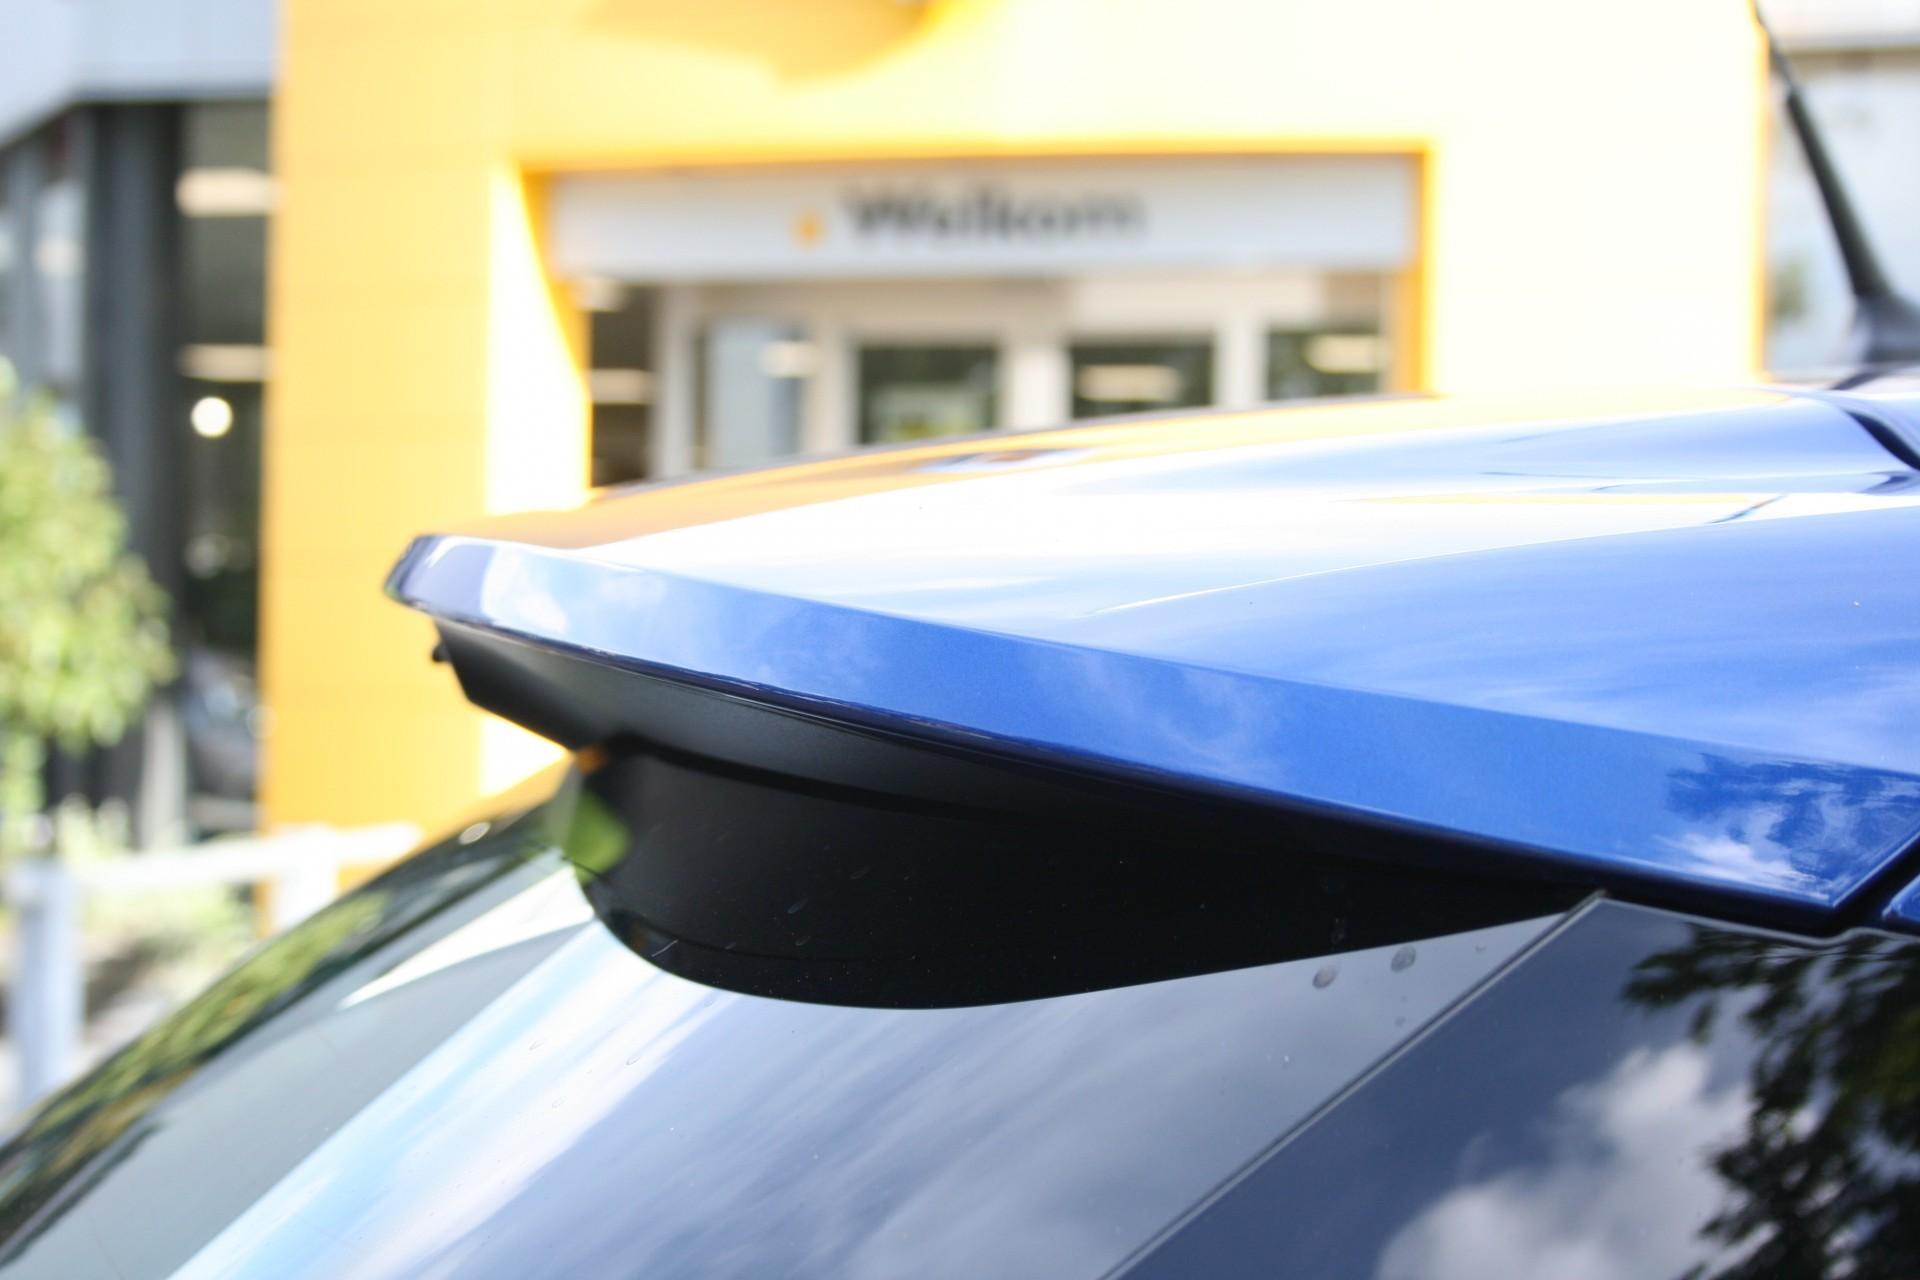 Renault Mégane foto 14